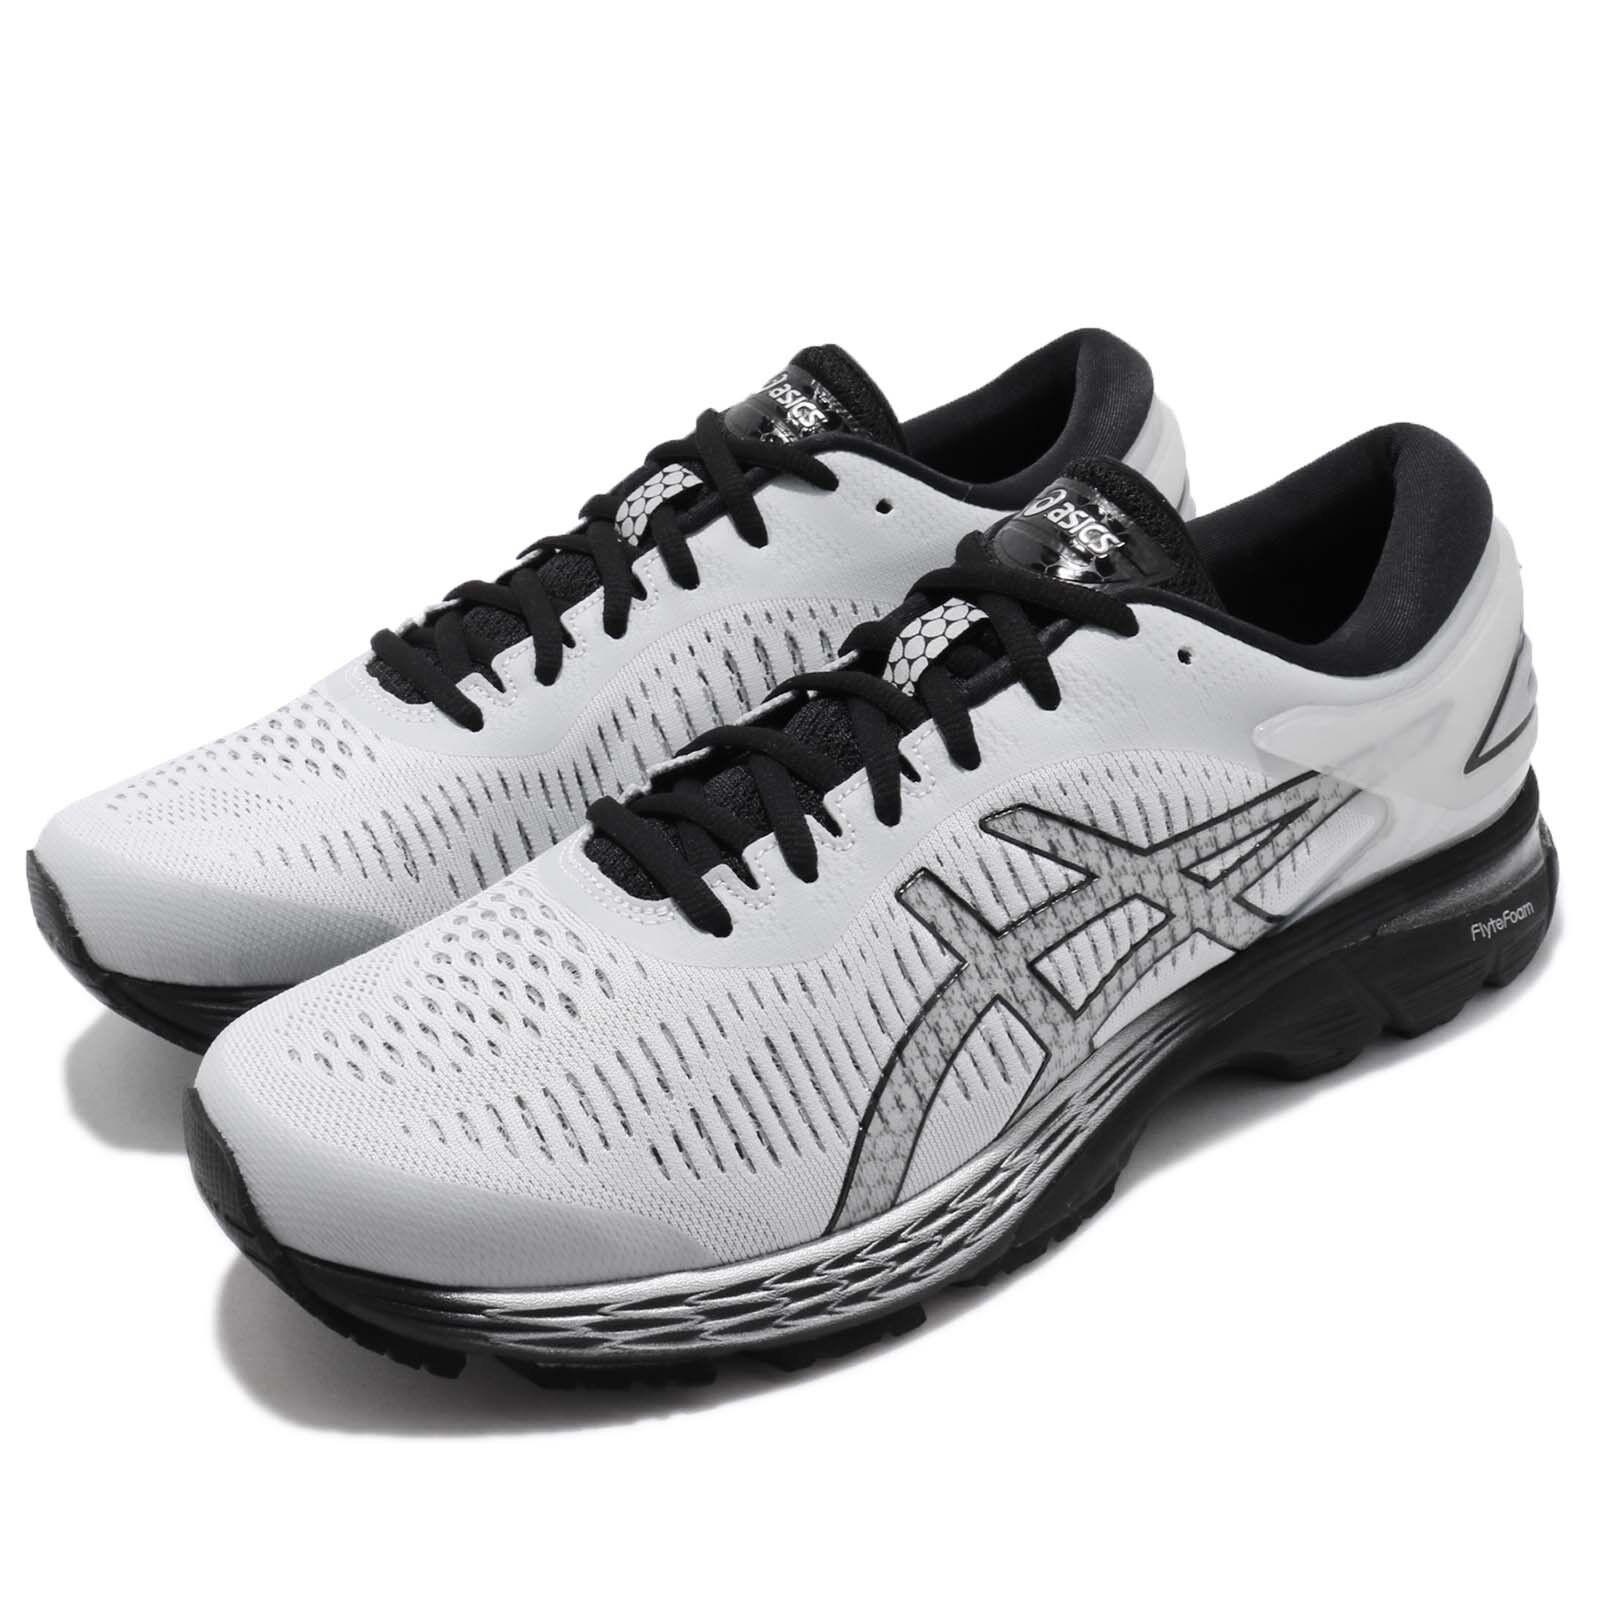 58b4521f1f57 Asics Gel-Kayano 25 2E 2E 2E Wide Grey Black Men Running Shoes Sneakers  1011A029